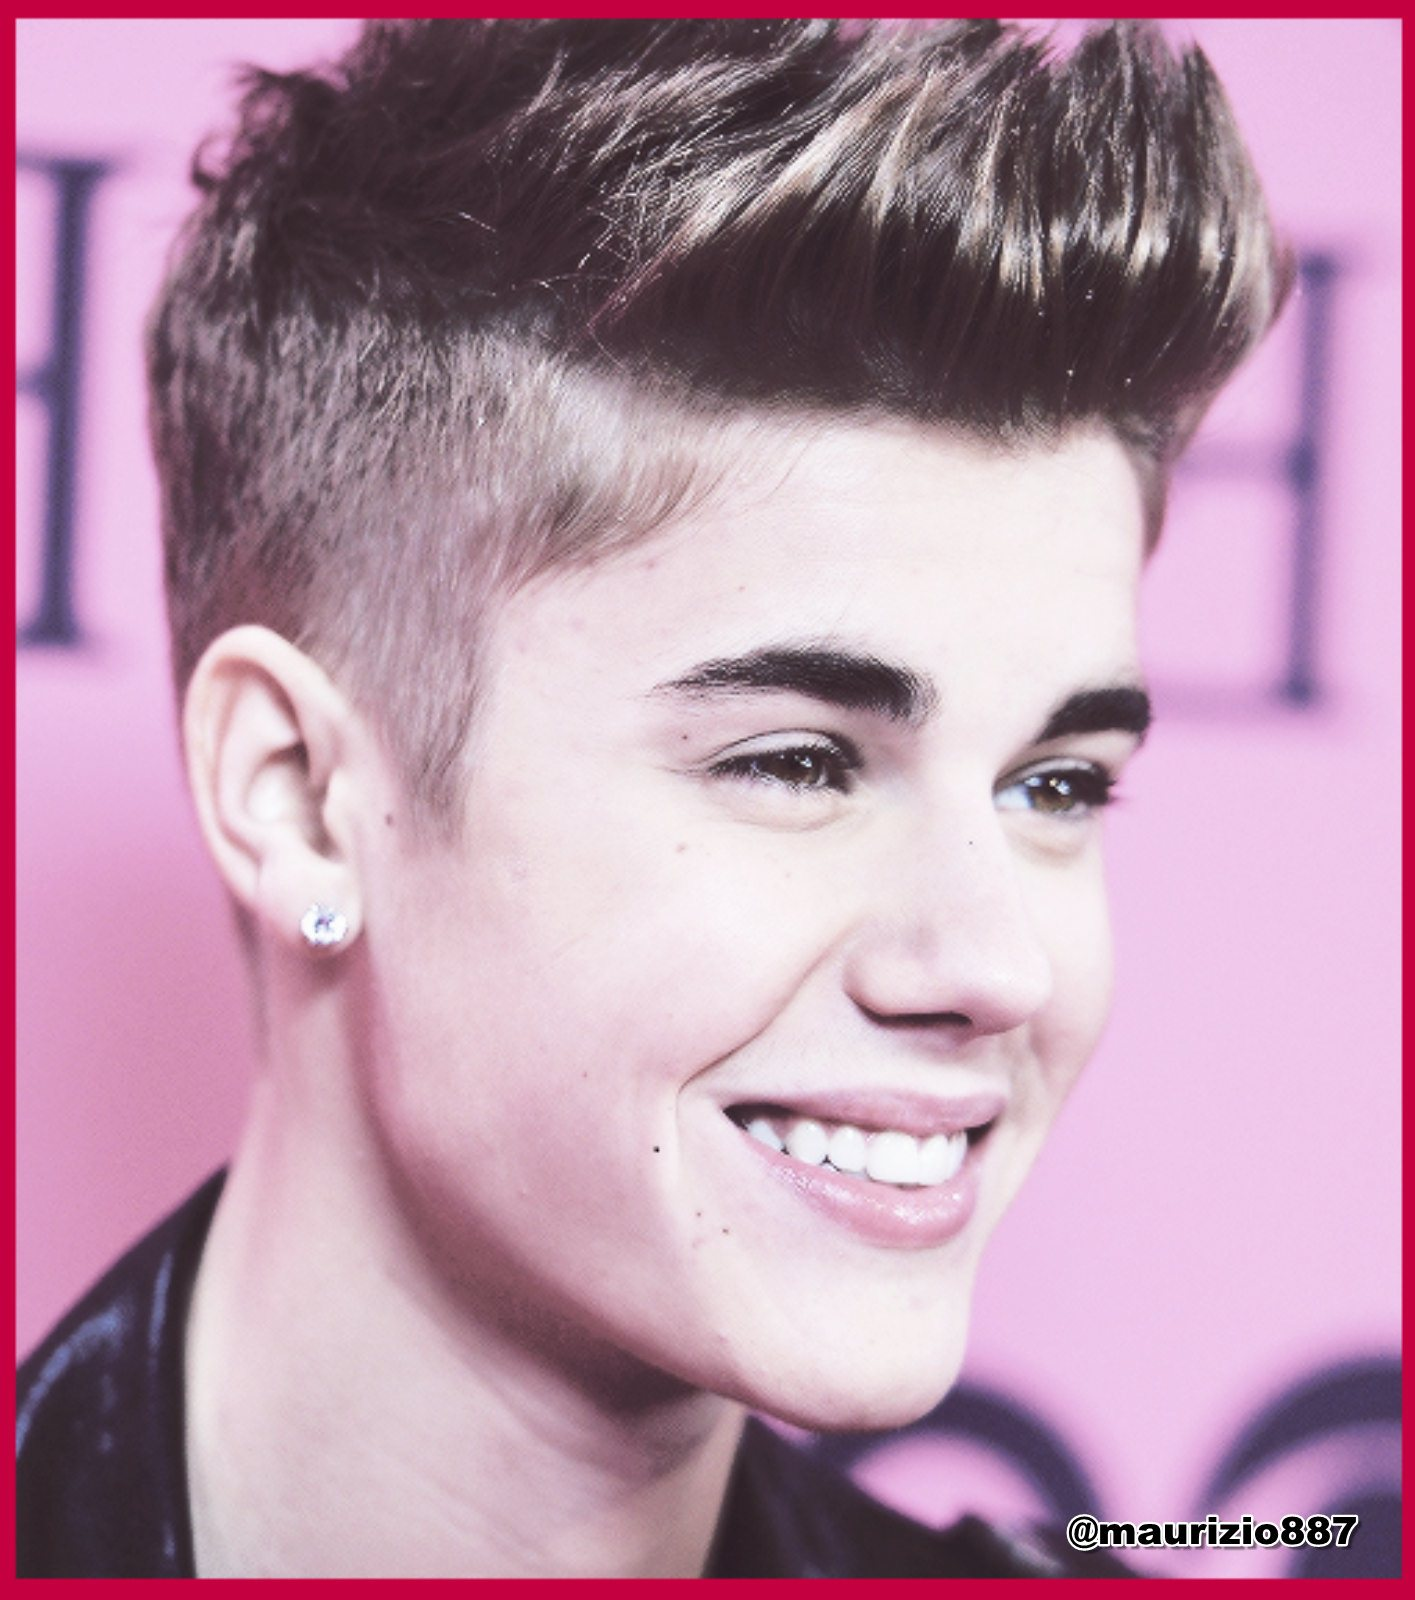 Justin Bieber Vs Fashion Show 2012 Justin Bieber Photo